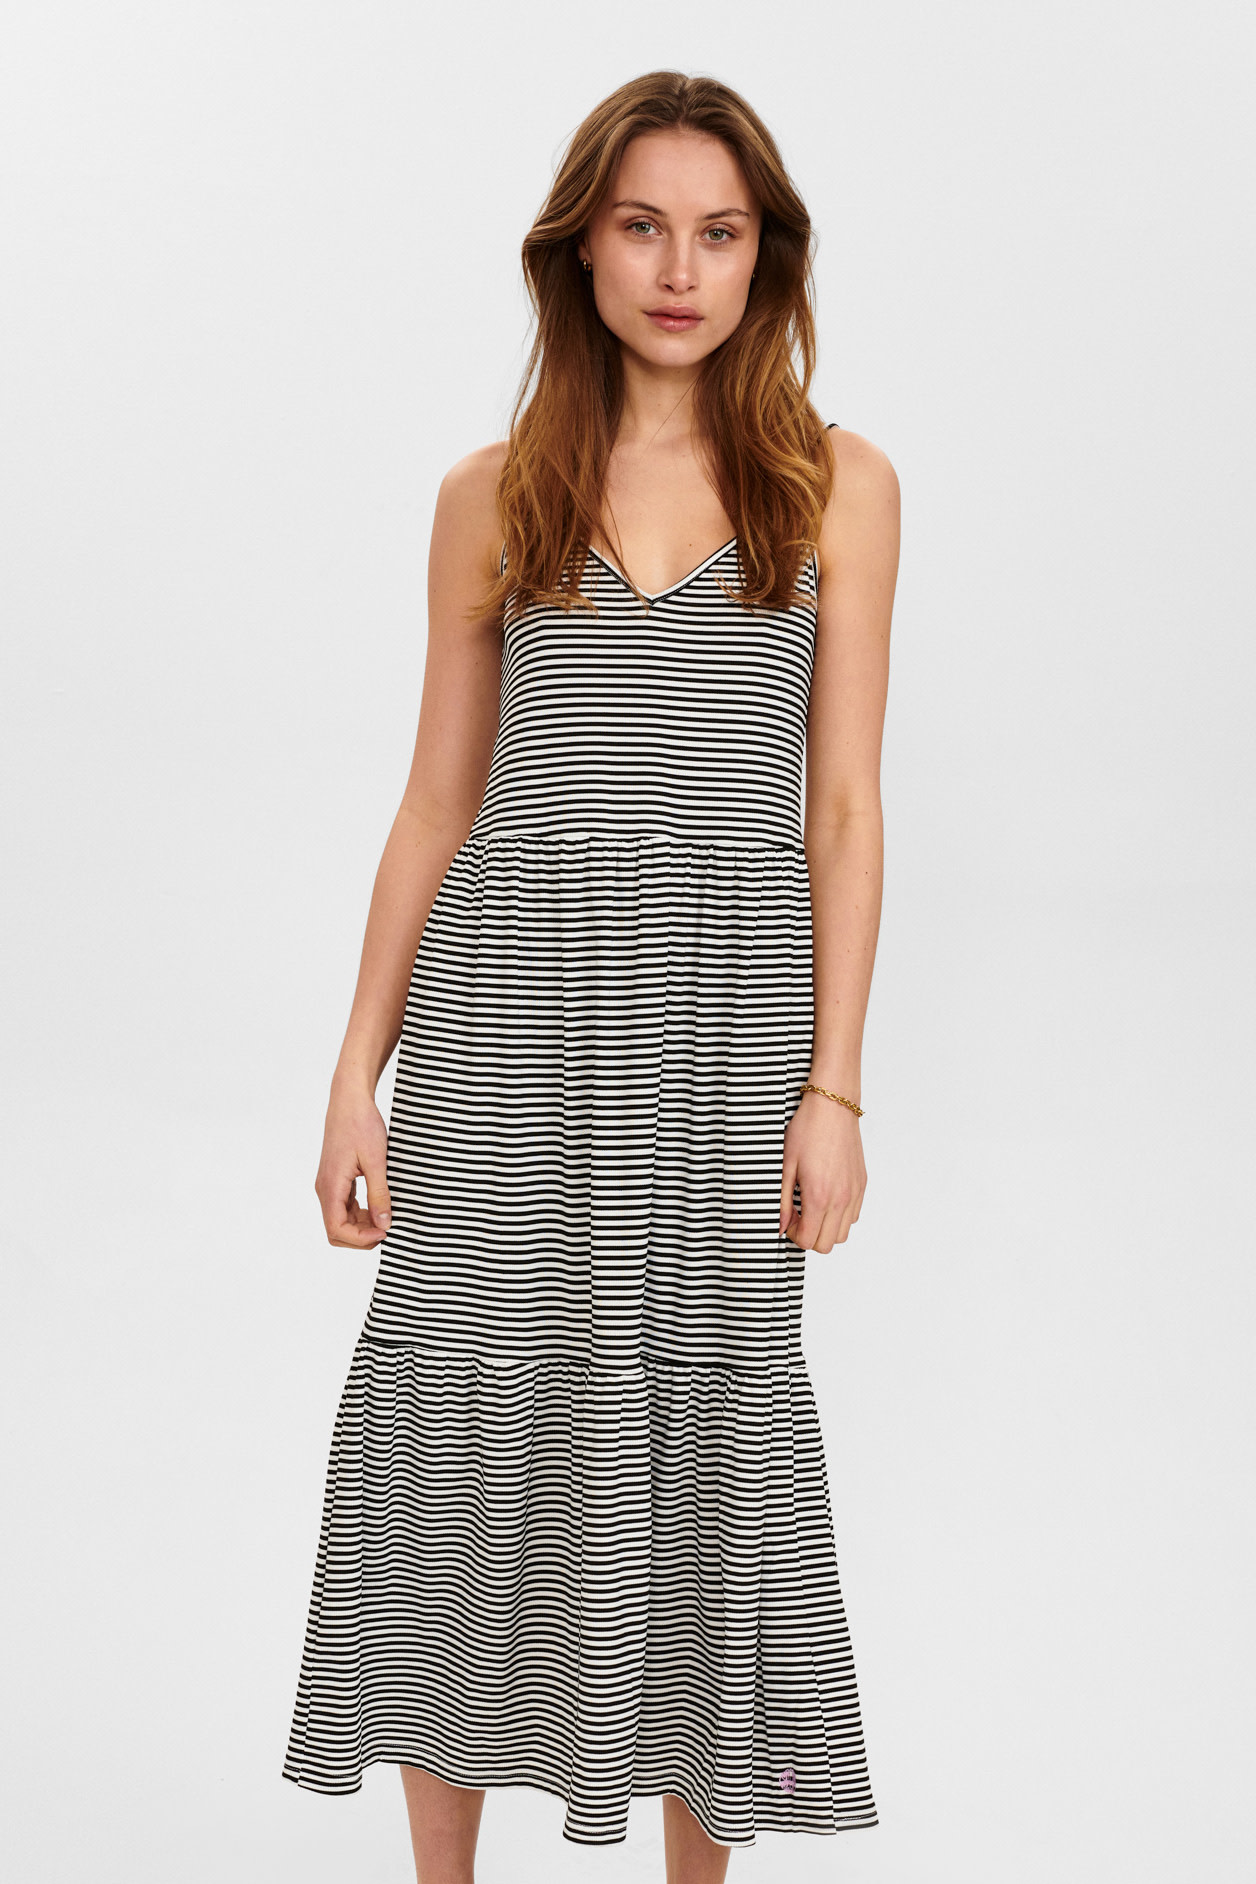 Nümph Charty Dress - Zwart/Wit